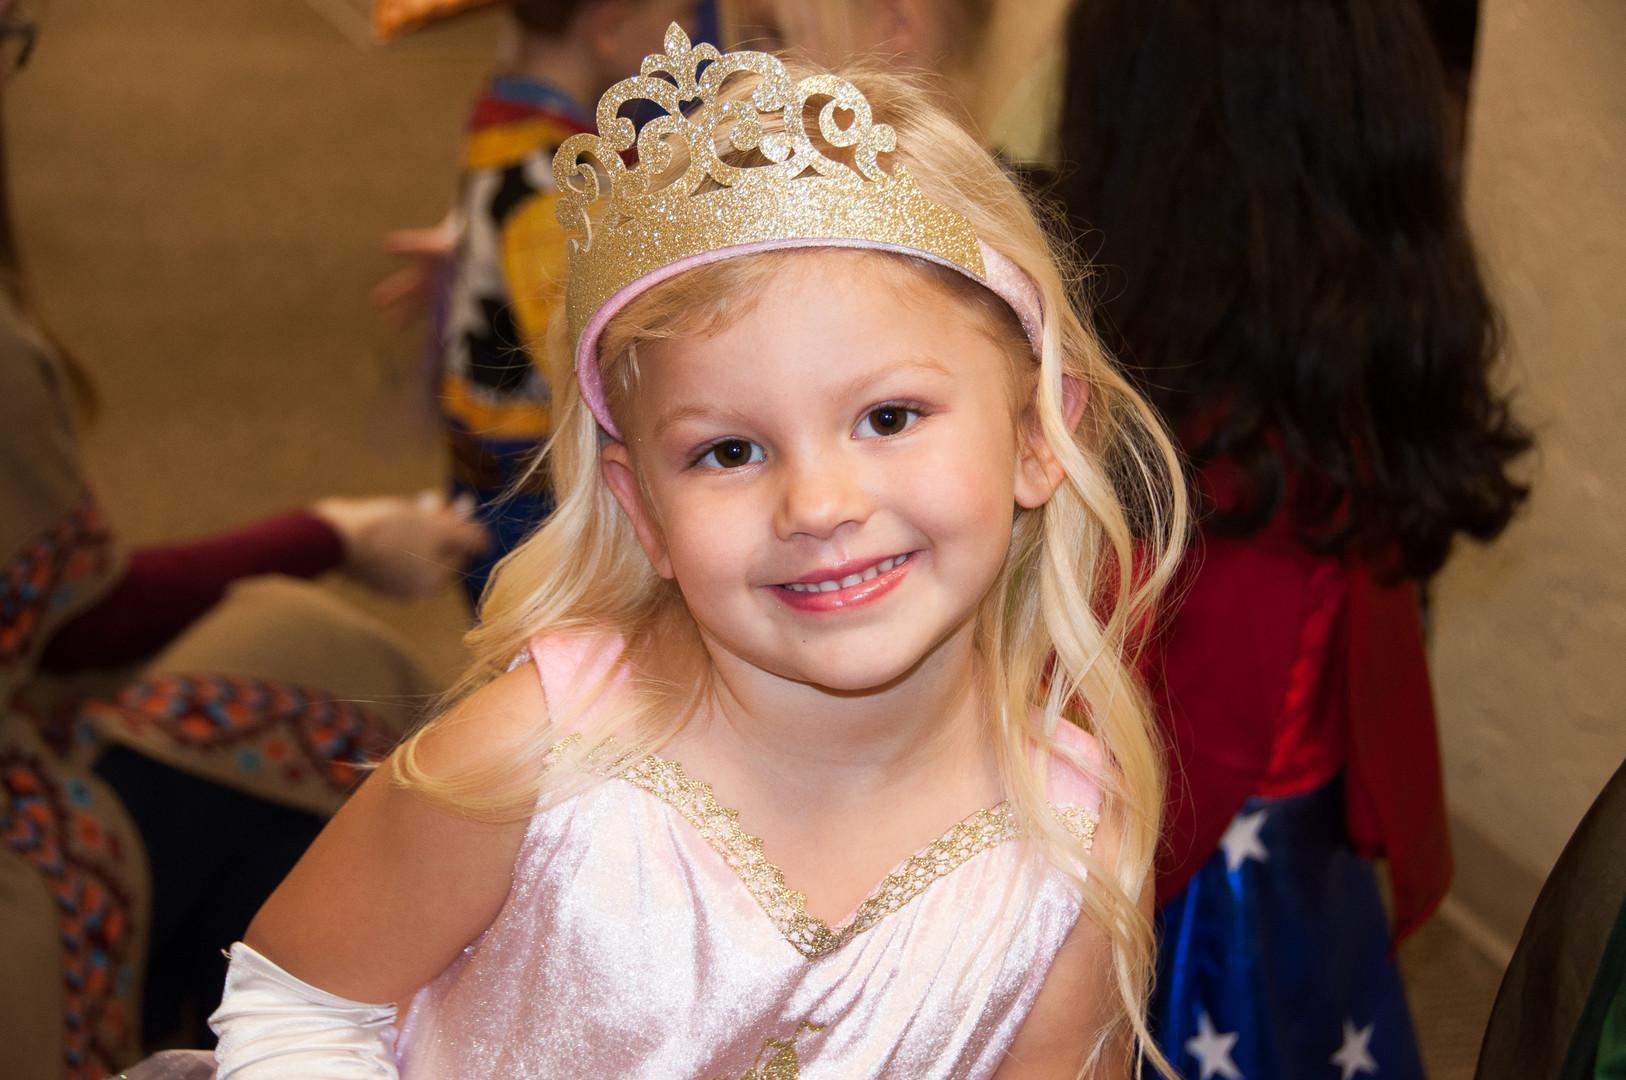 A perfect princess.